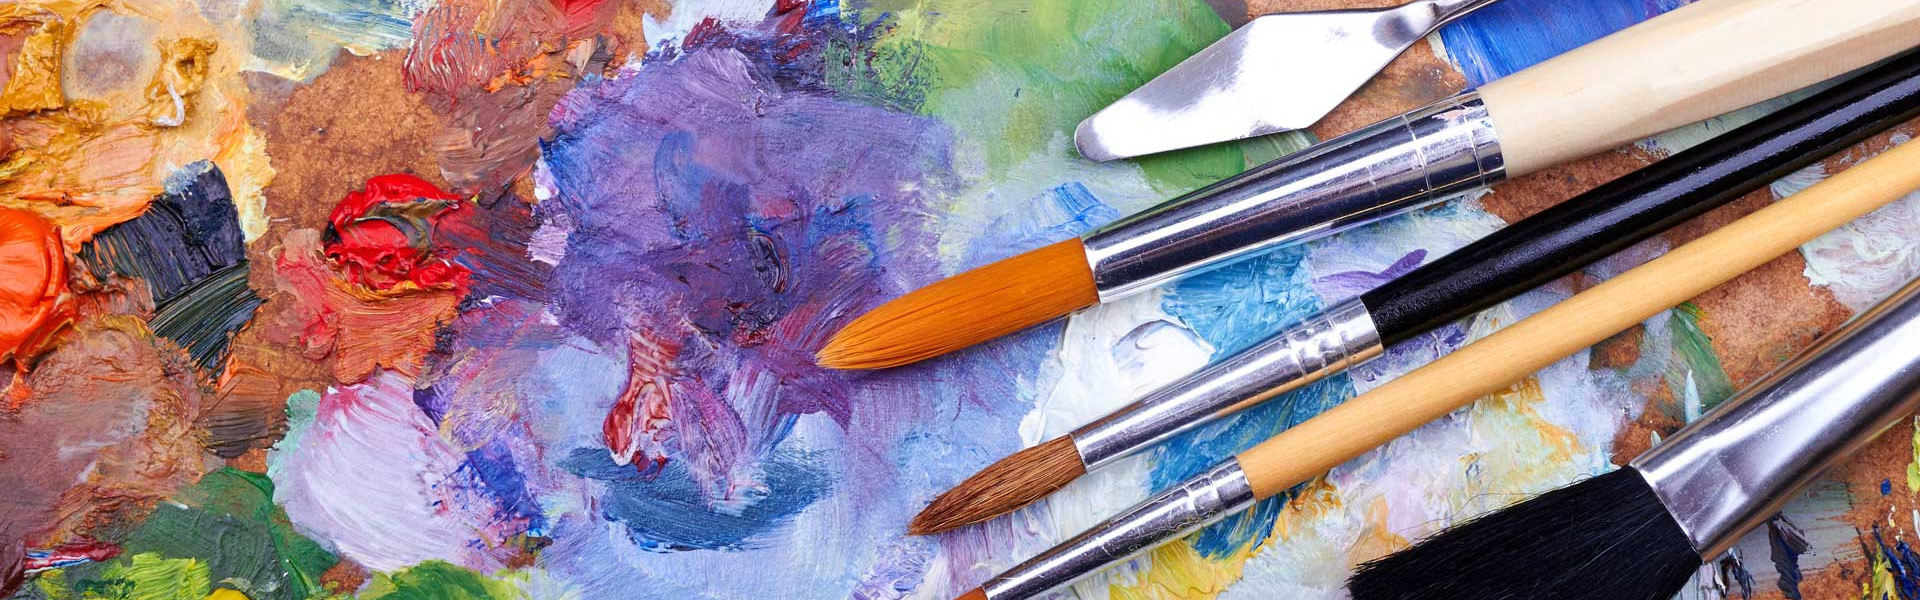 News del Colorificio Pramar | Casale Monferrato (AL)